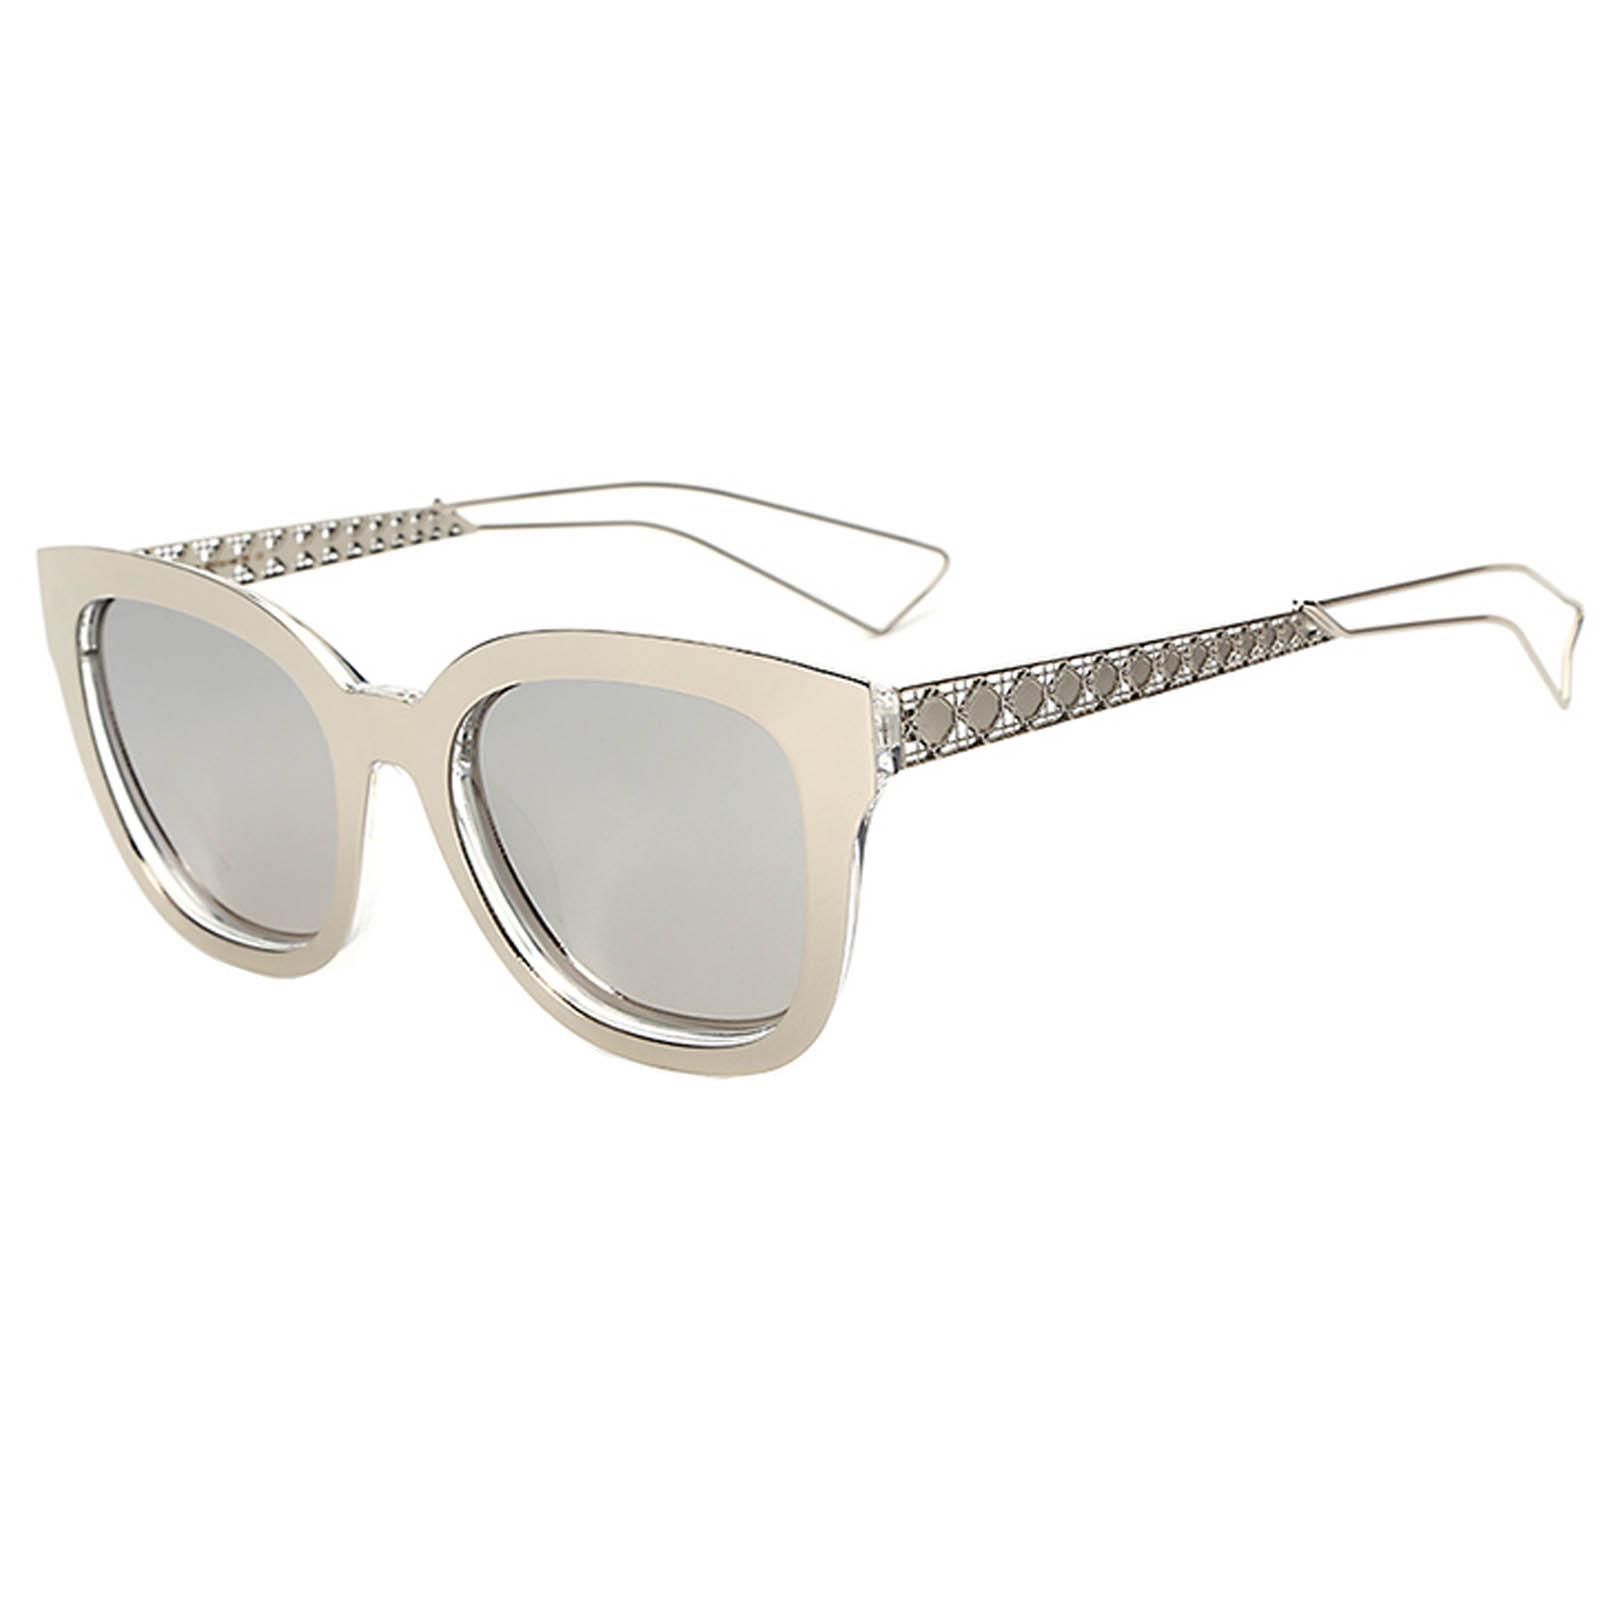 OWL ® 005 C6 Cat Rectangle Eyewear Sunglasses Women's Men's Metal Silver Frame Silver Lens One Pair